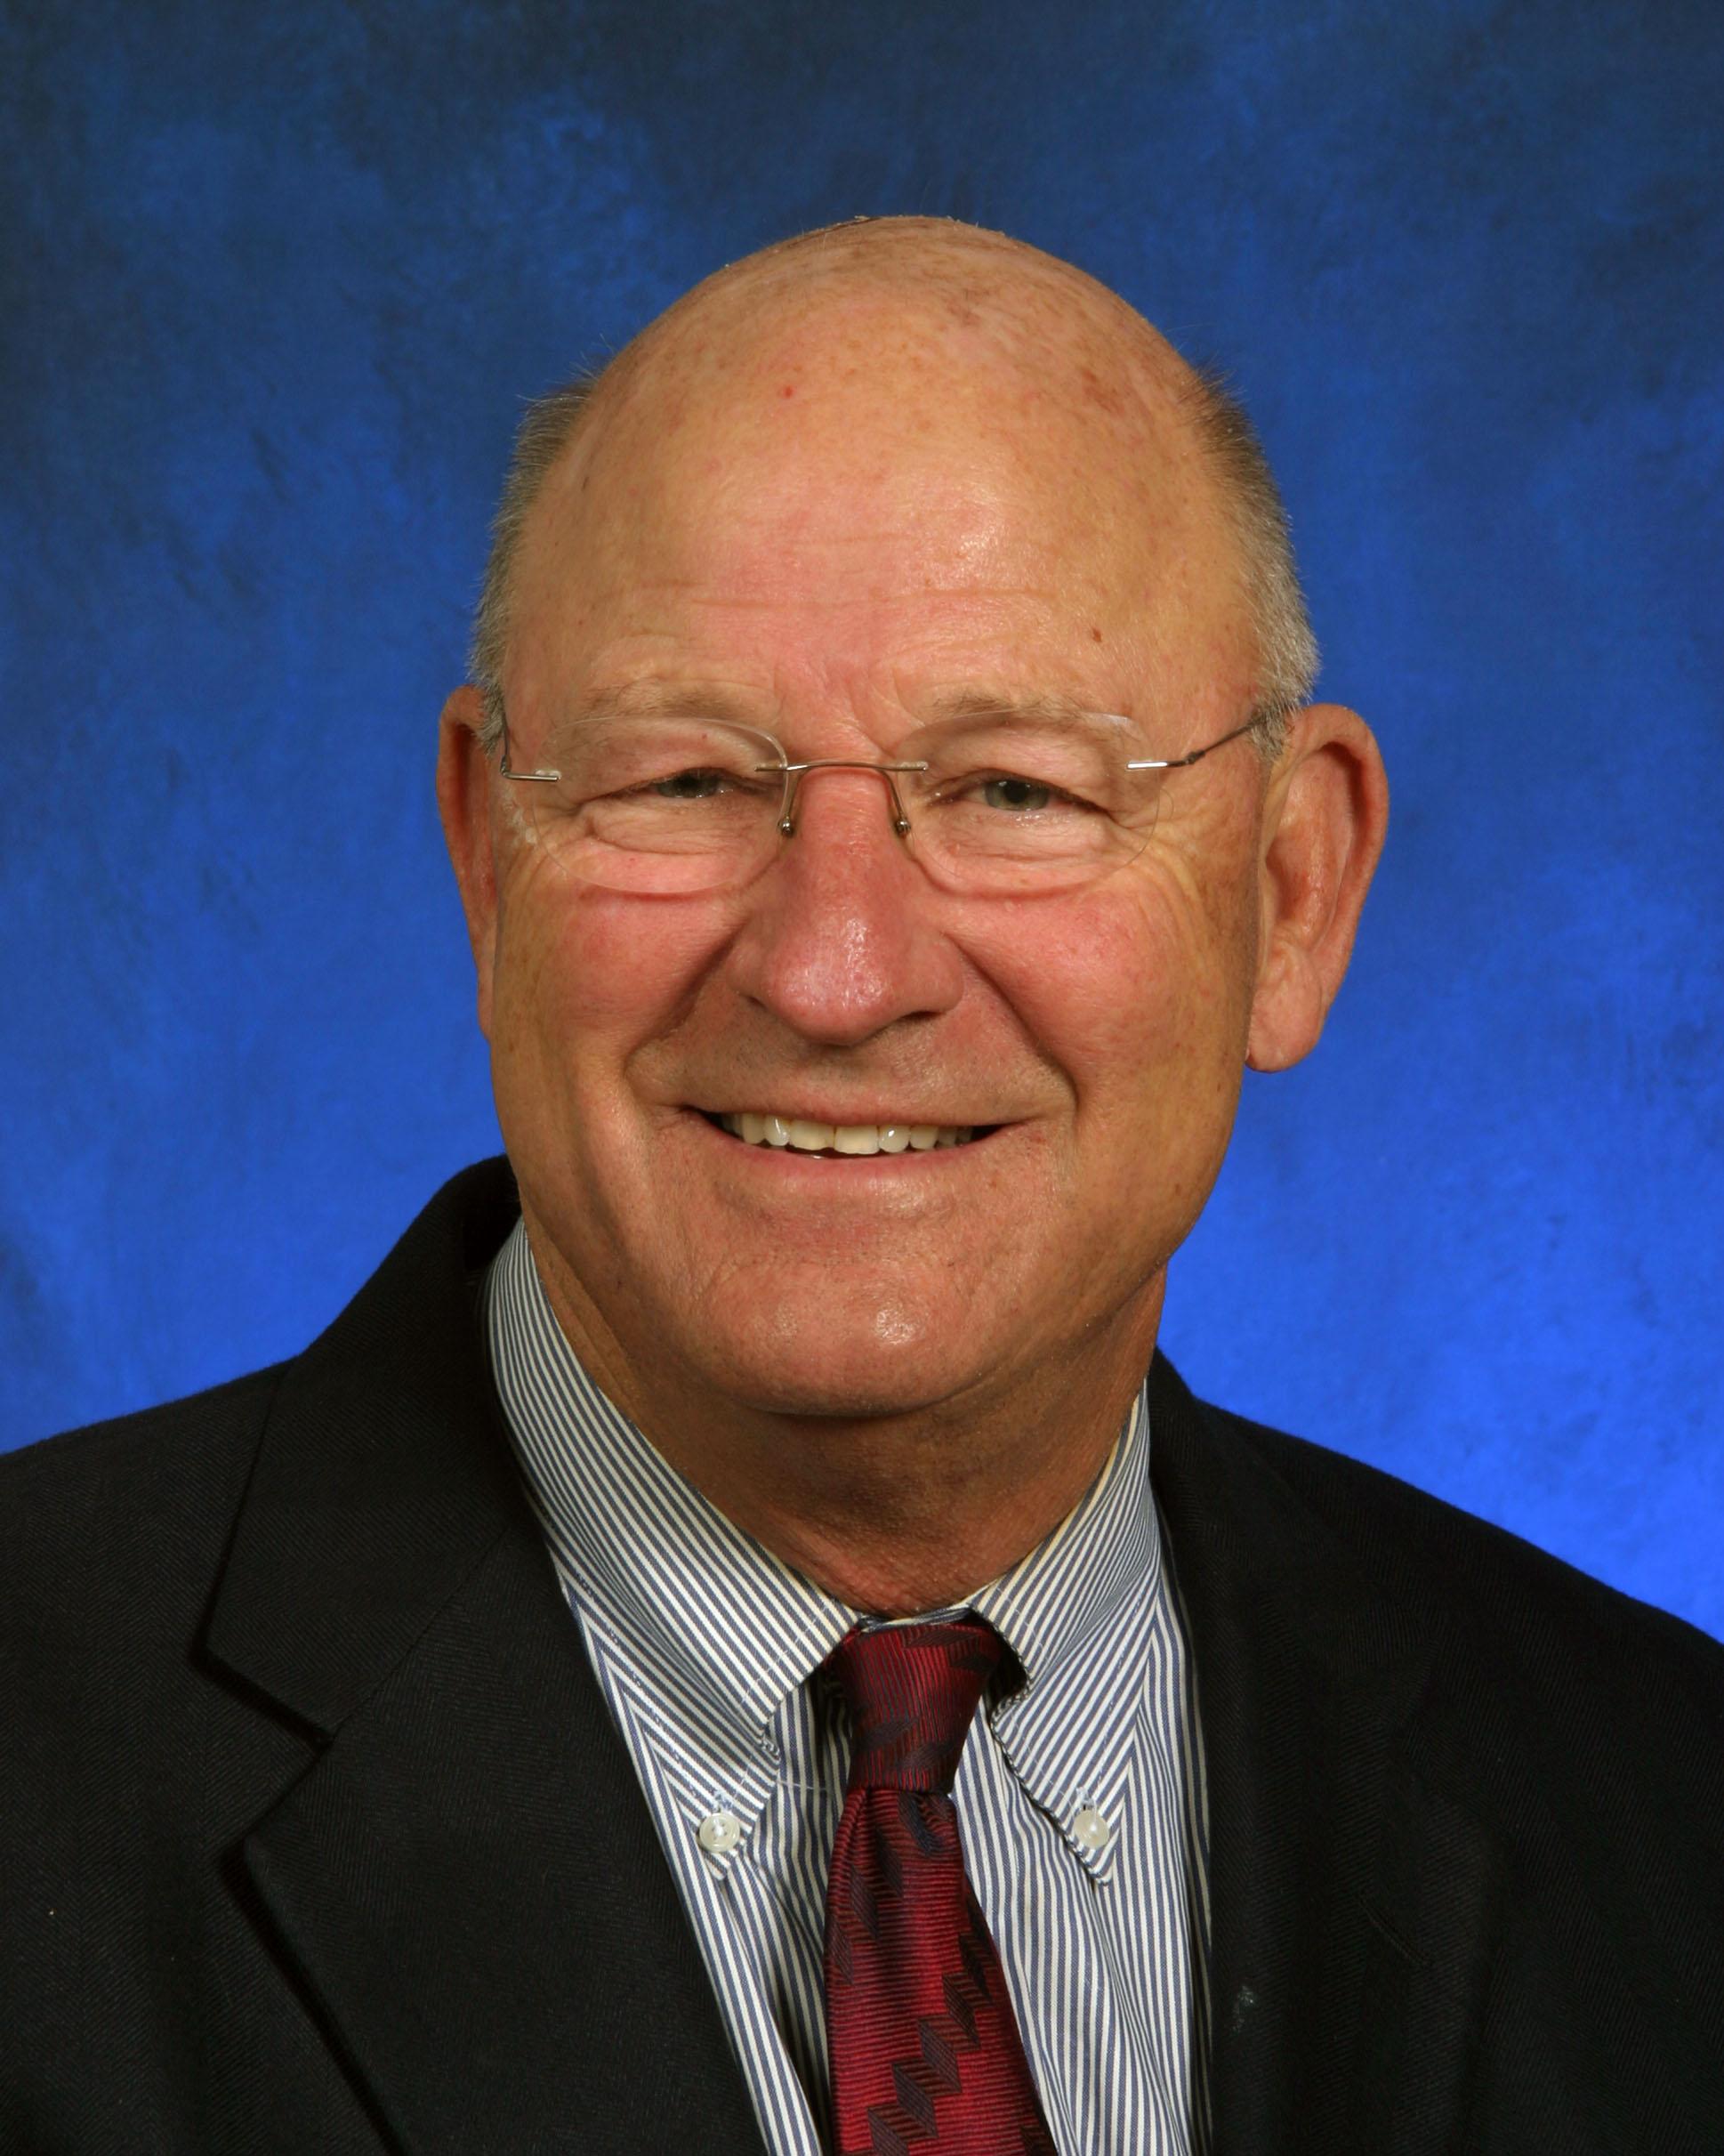 Frank Havard